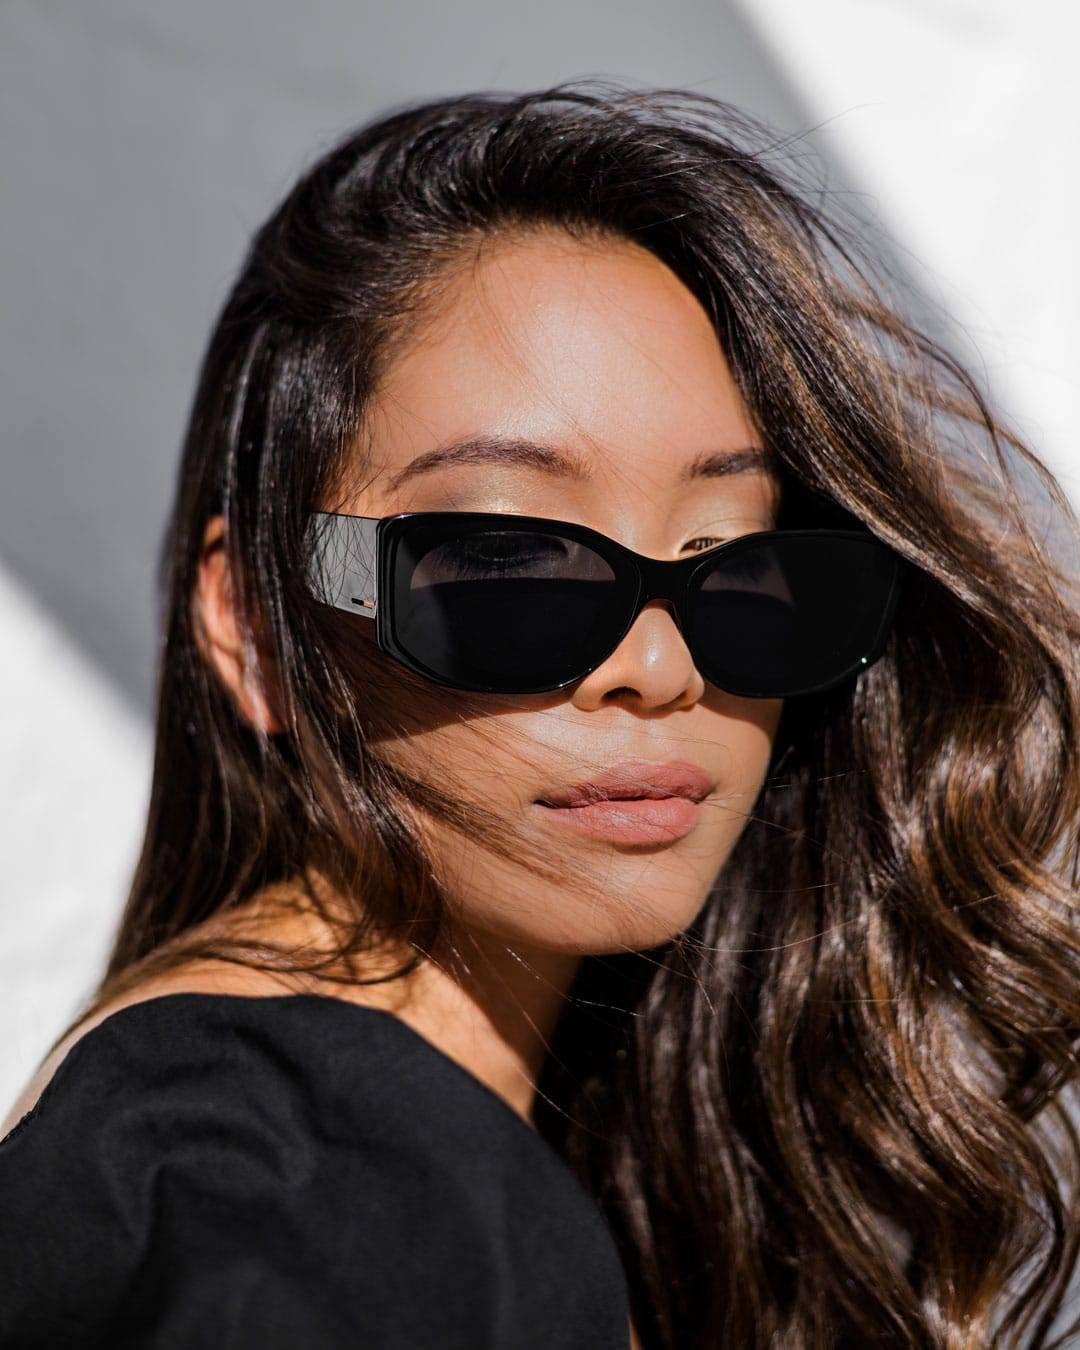 A woman with long dark hair wears and oval sunglass shape.